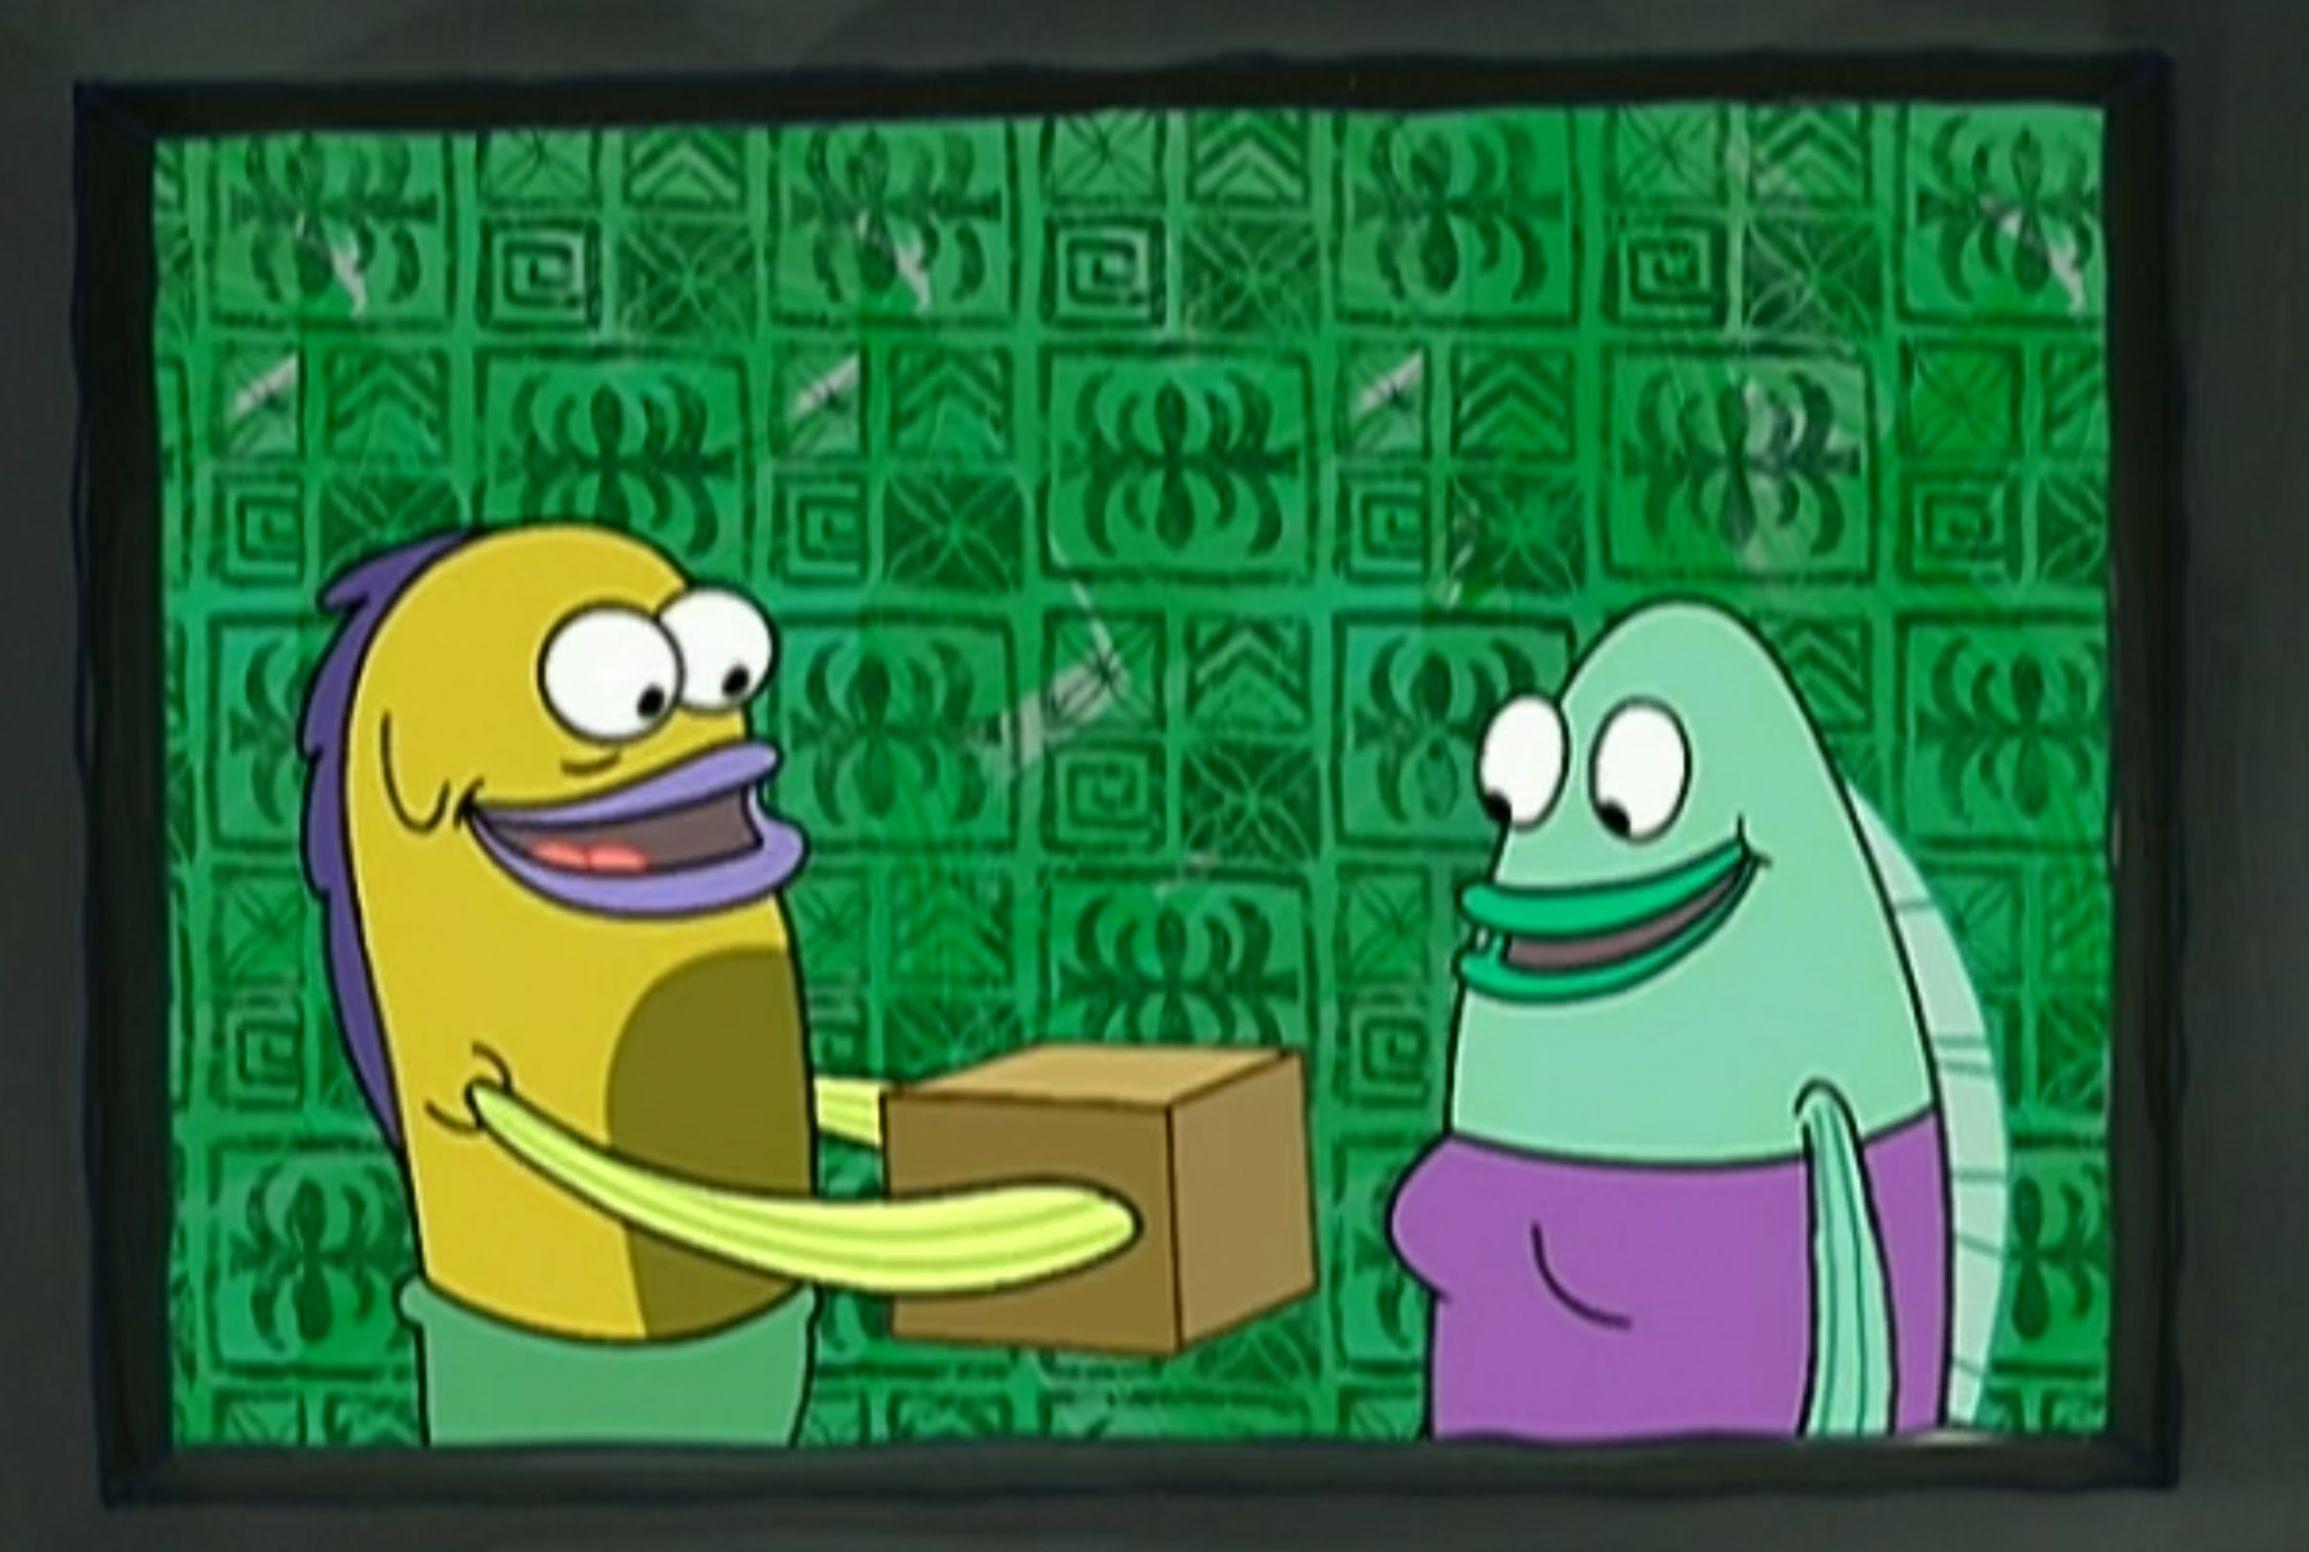 High quality spongebob box blank meme template